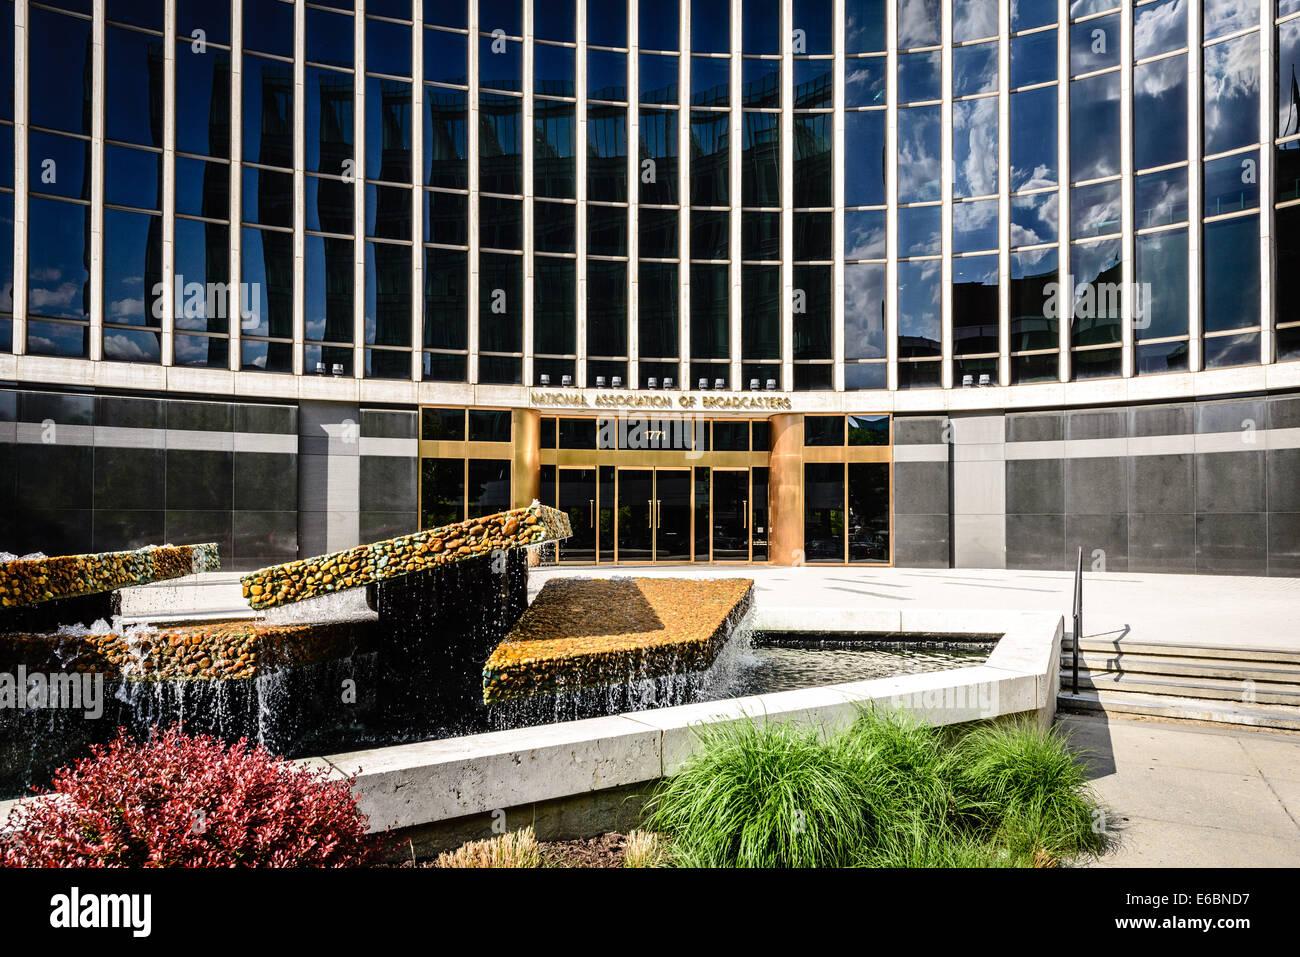 National Association of Broadcasters Headquarters, 1771 N Street NW, Washington DC Stock Photo